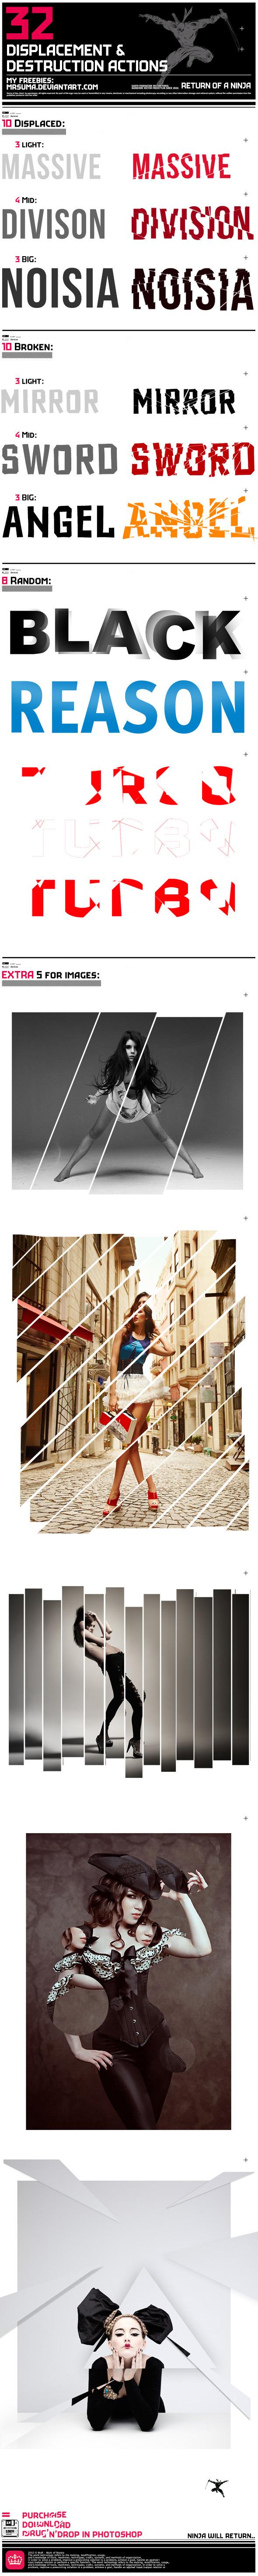 32 Displace & Distort Effect - Actions Photoshop